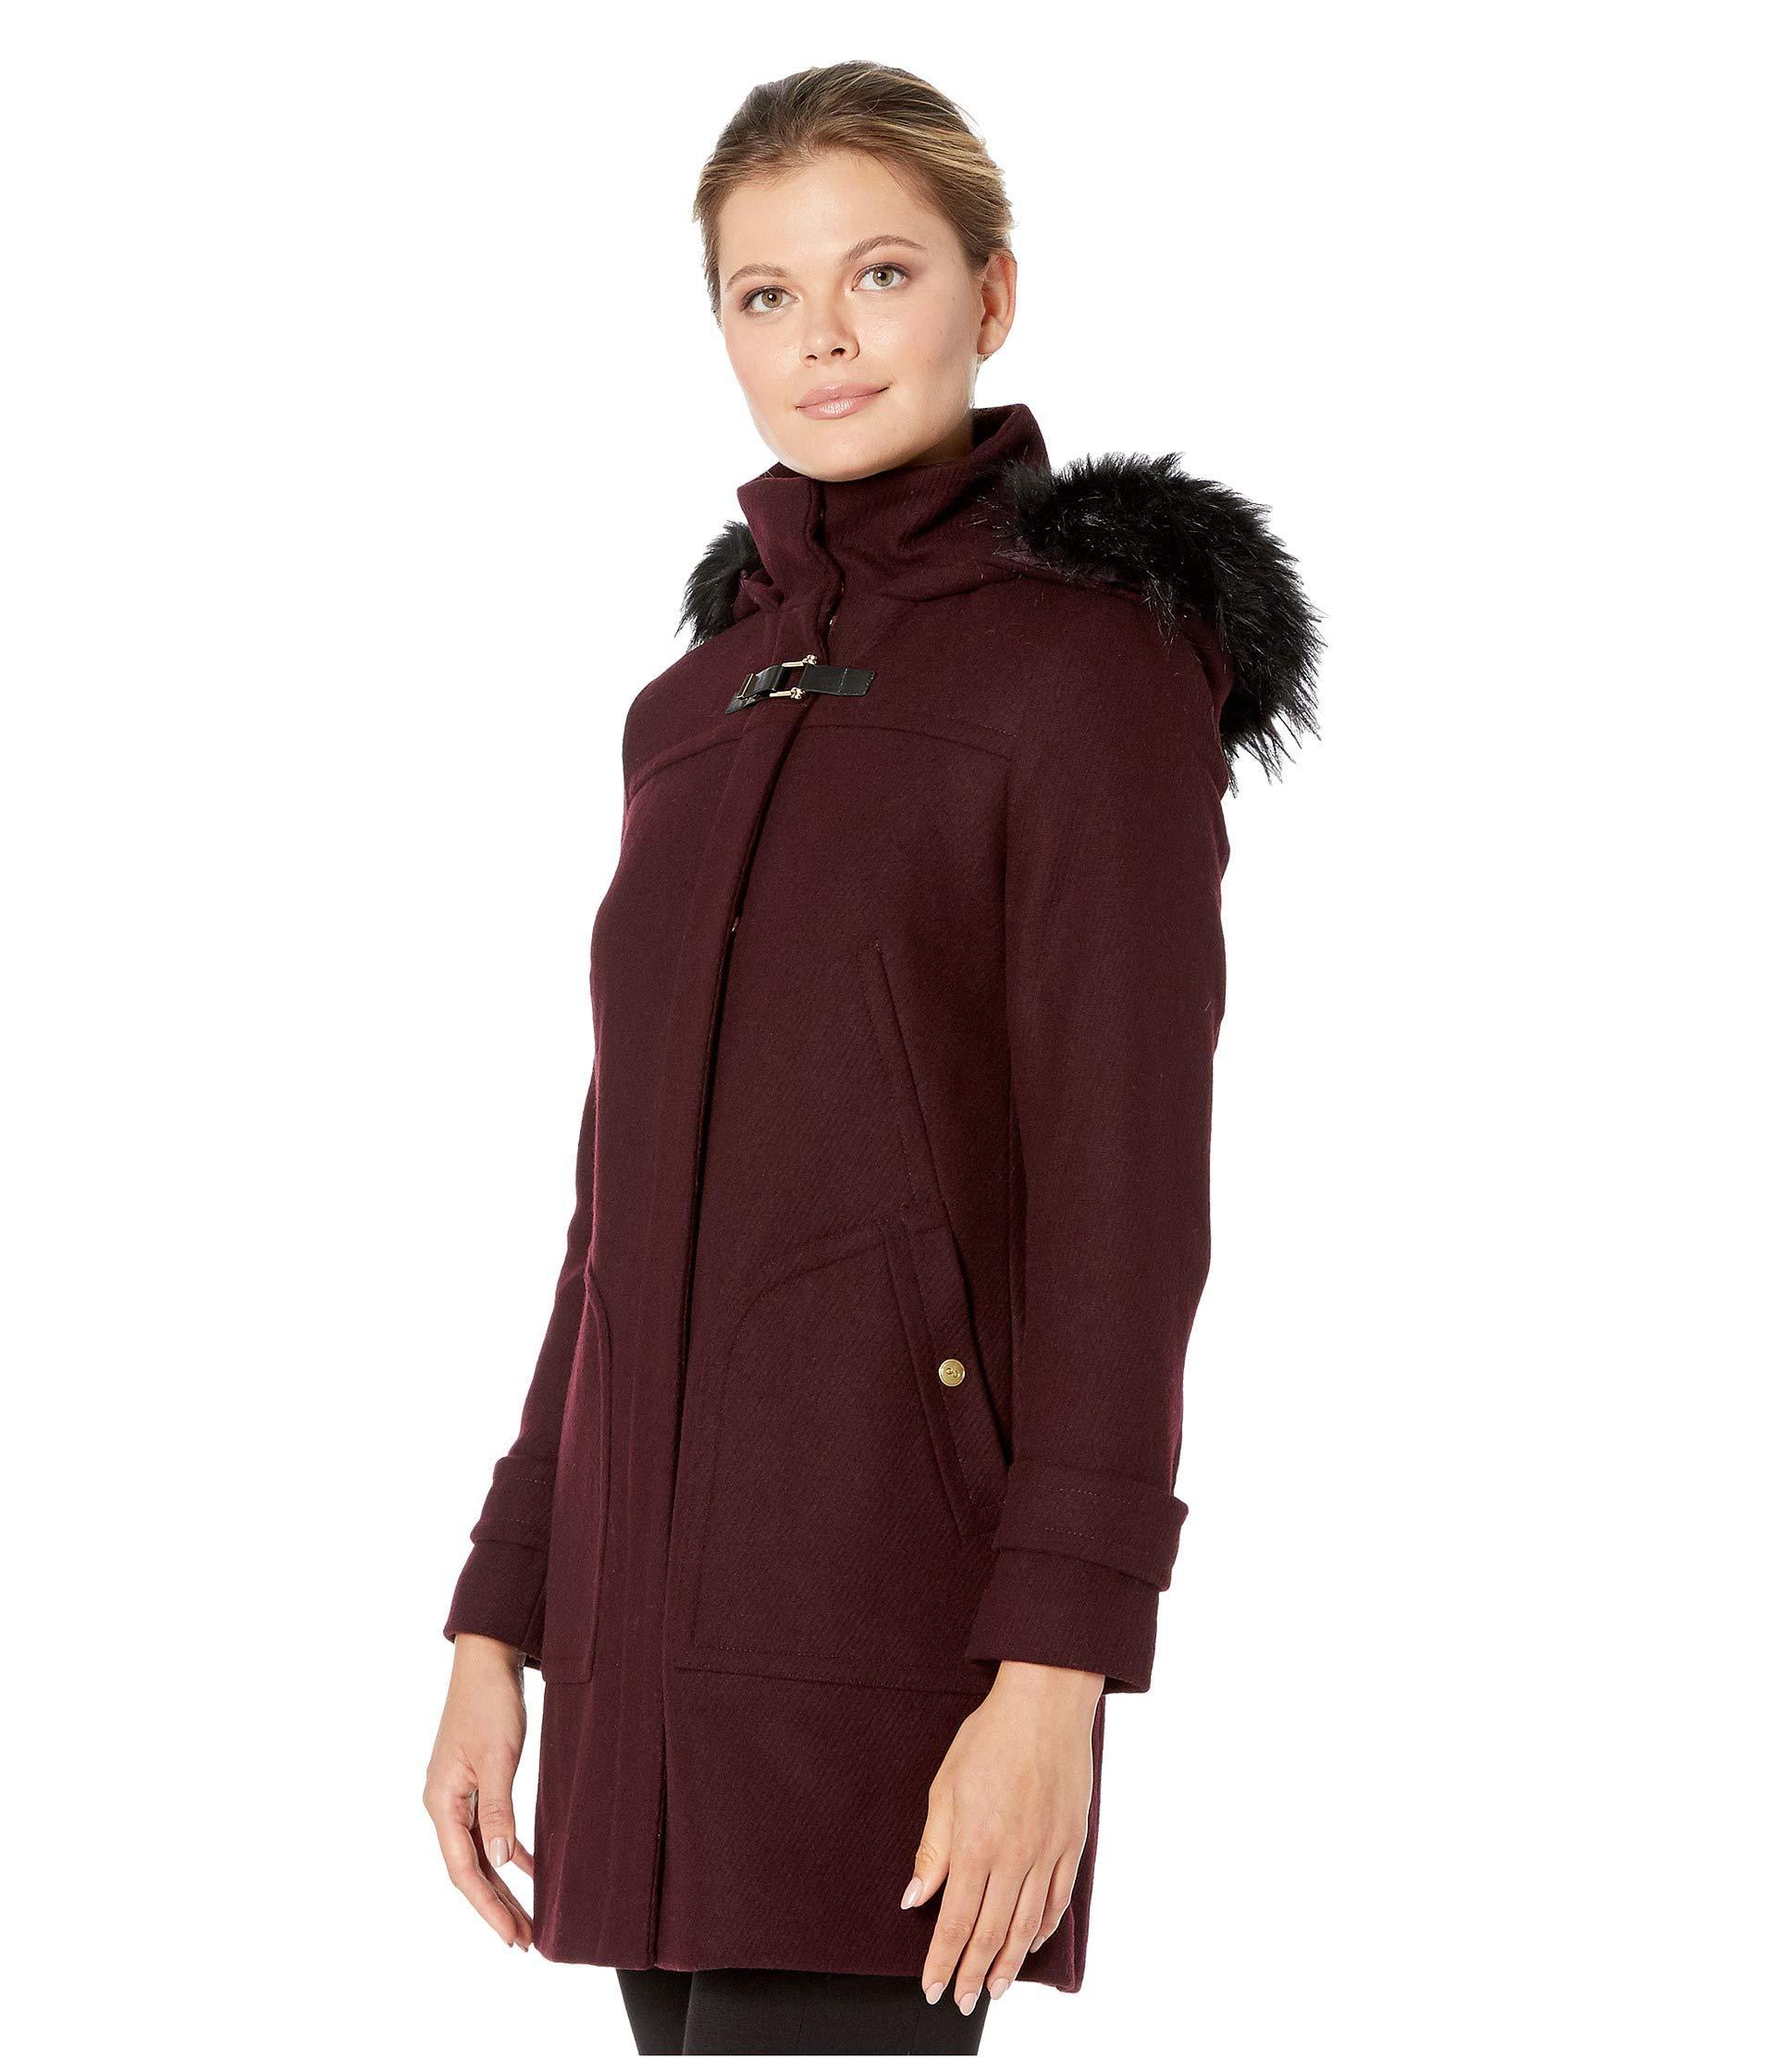 Cole Haan Womens Wool Twill Short Duffel Coat